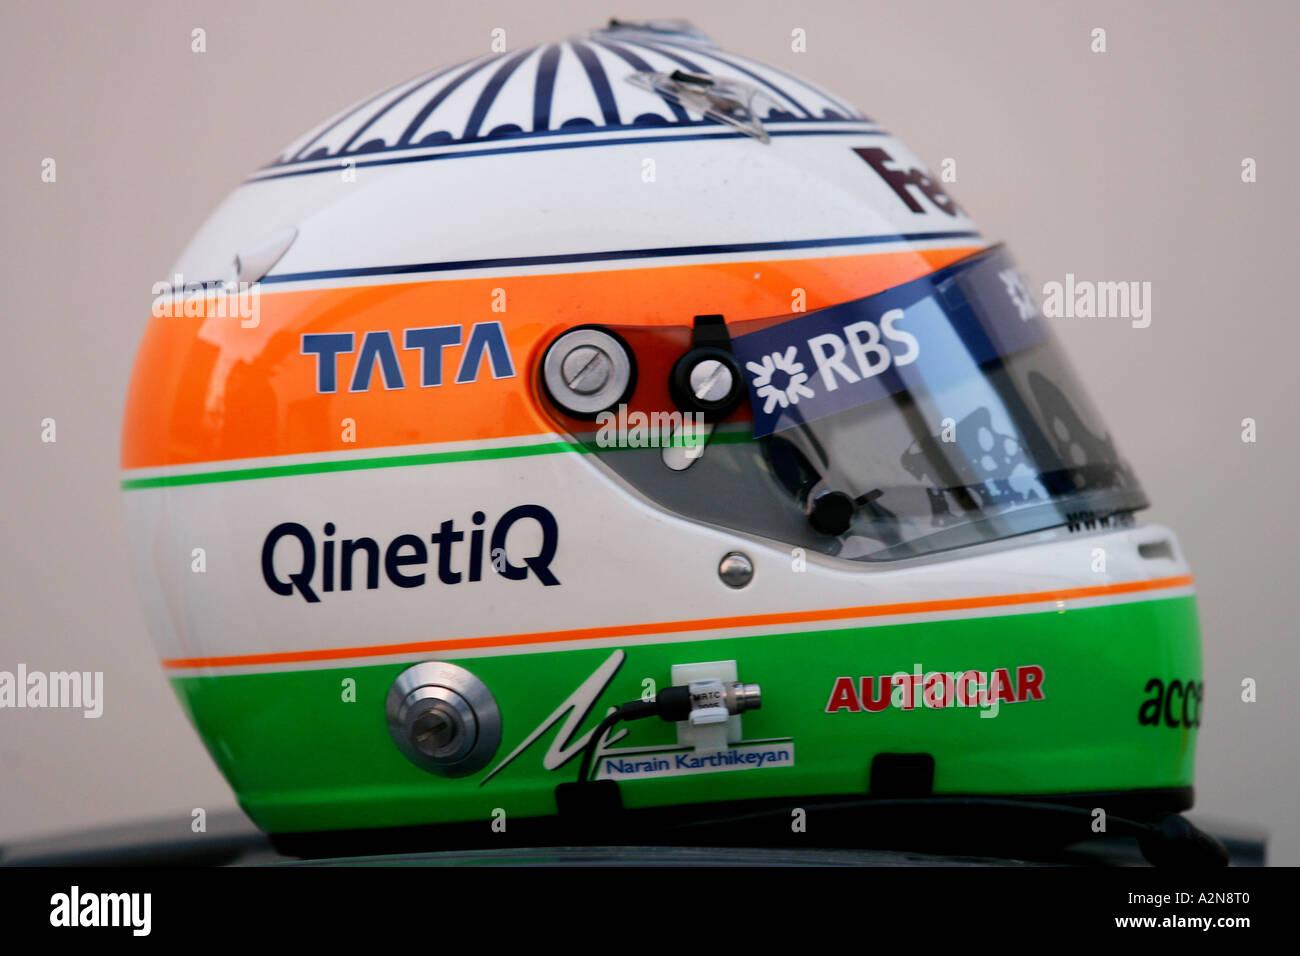 The helmet of Narain Karthikeyan IND Williams Cosworth FW27 Formula One Testing 14 17 12 05 Jerez Spain - Stock Image